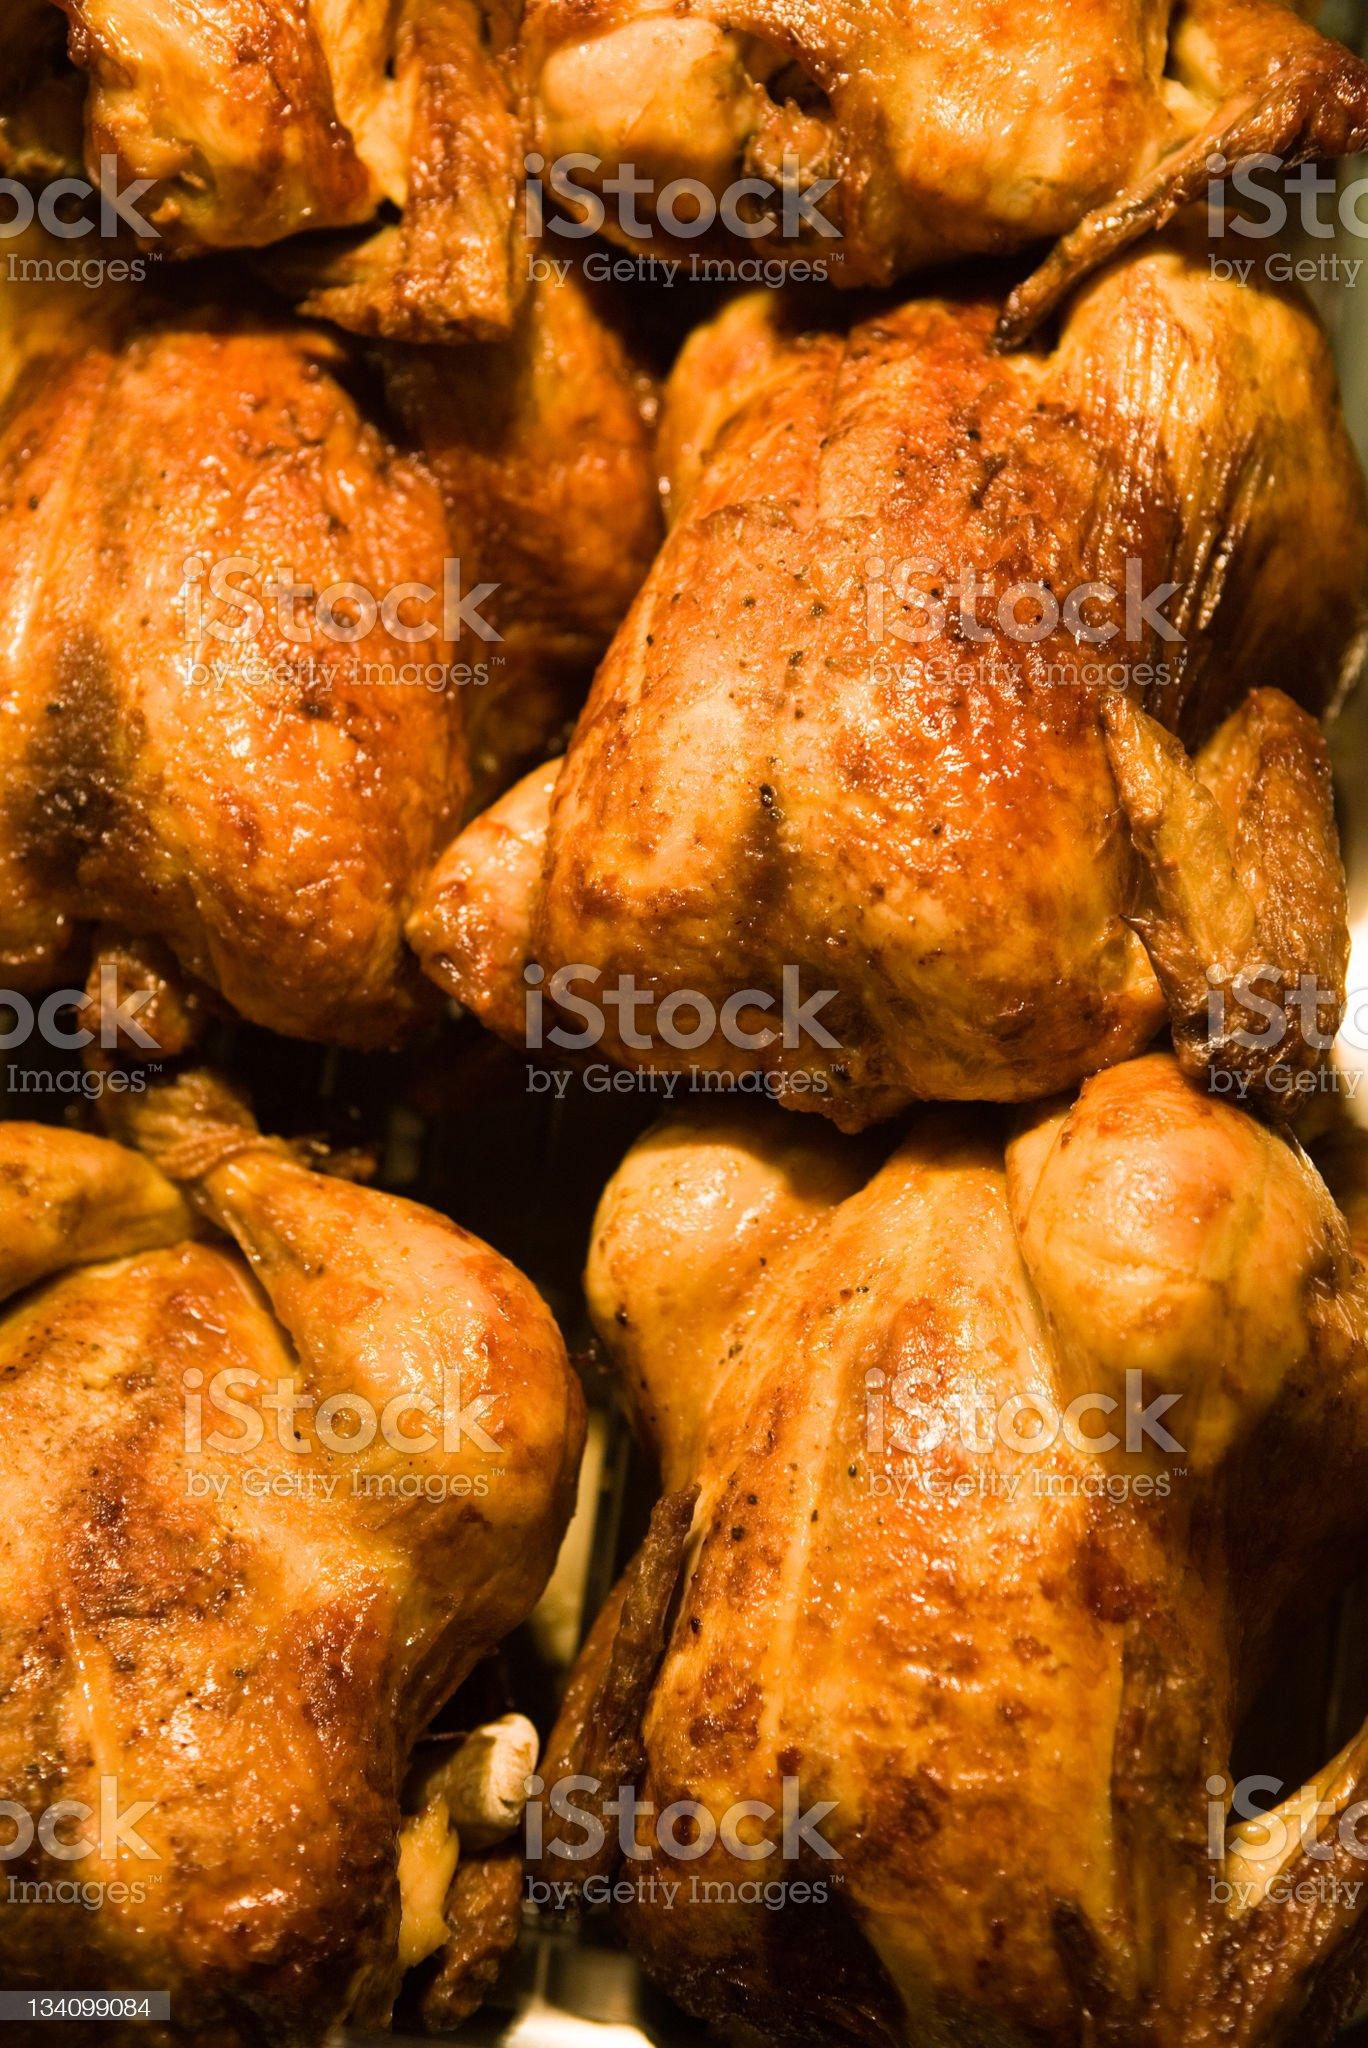 Roast chickens royalty-free stock photo